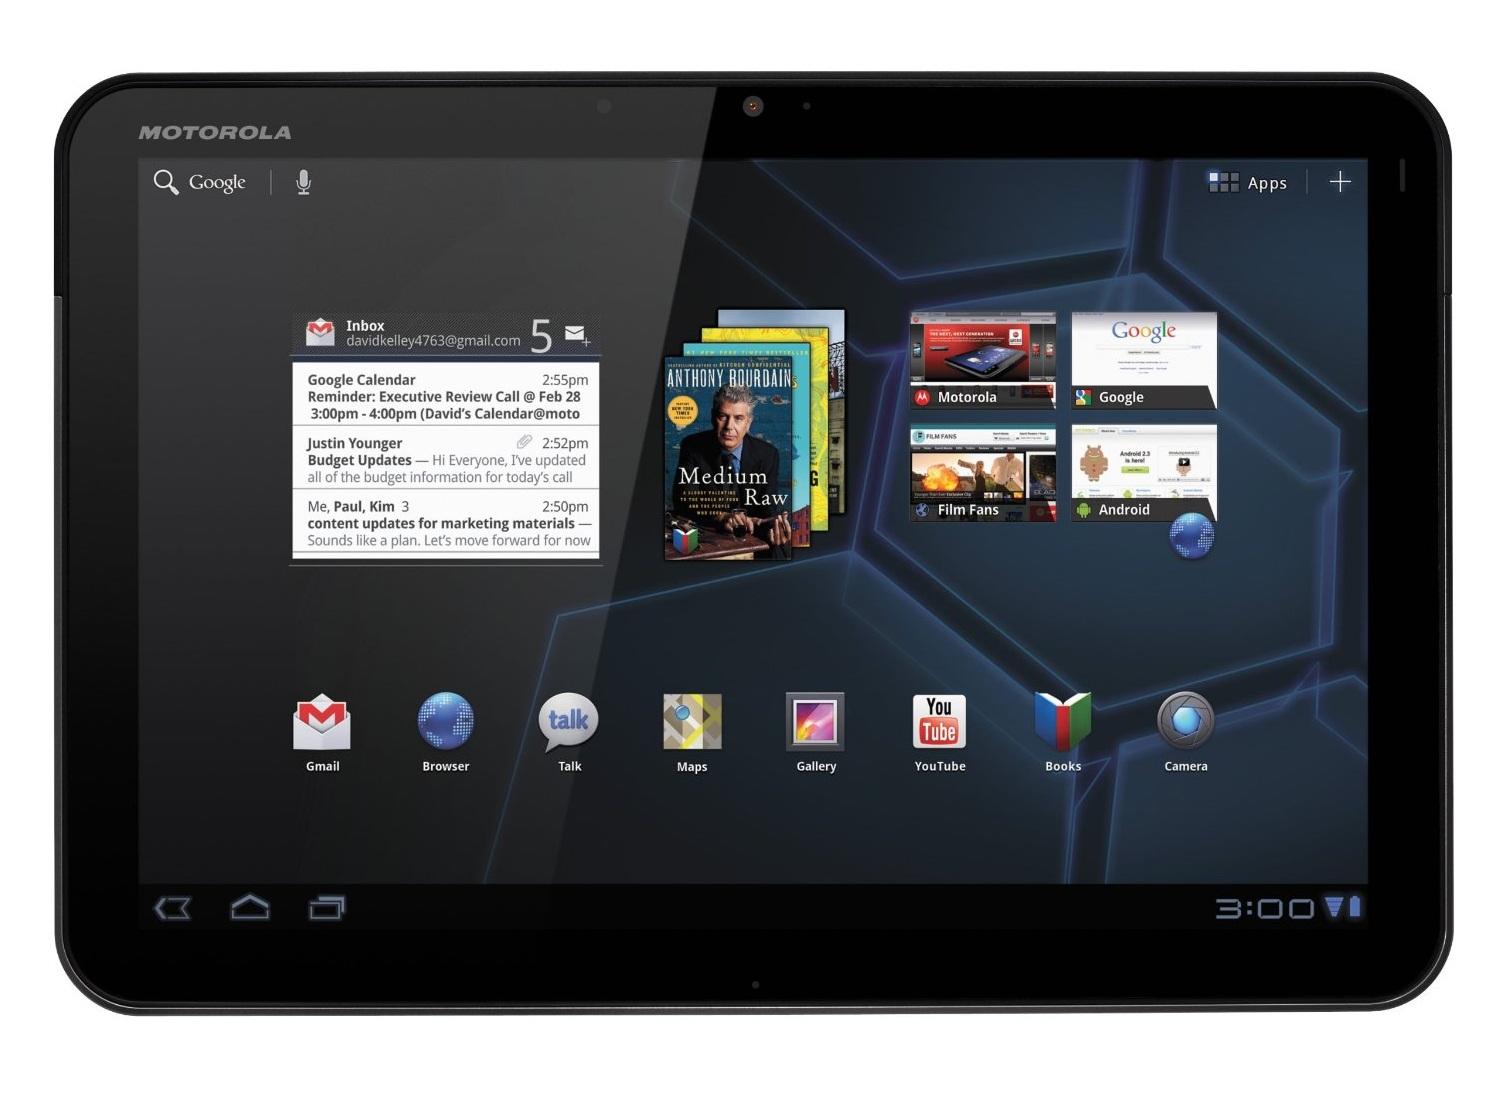 Motorola Xoom Mz604 Usb Driver Free Download For Windows